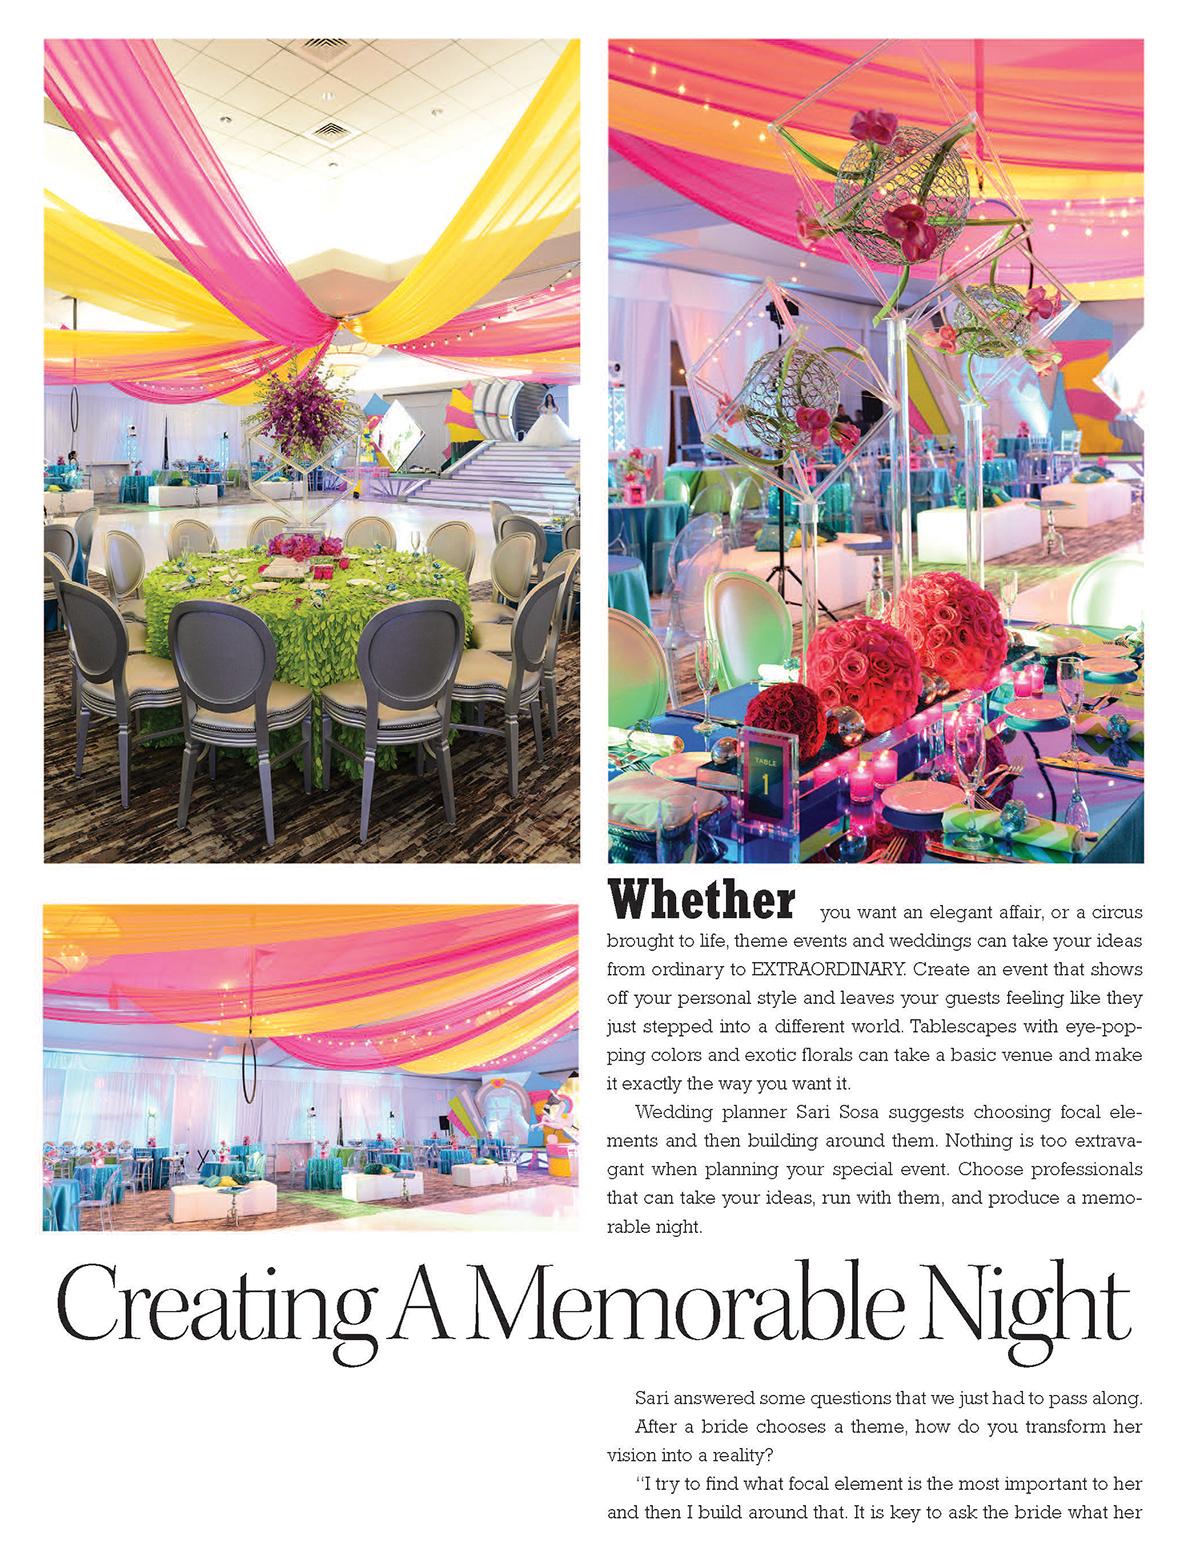 Creating A Memorable Night | ENCHANTED BRIDES